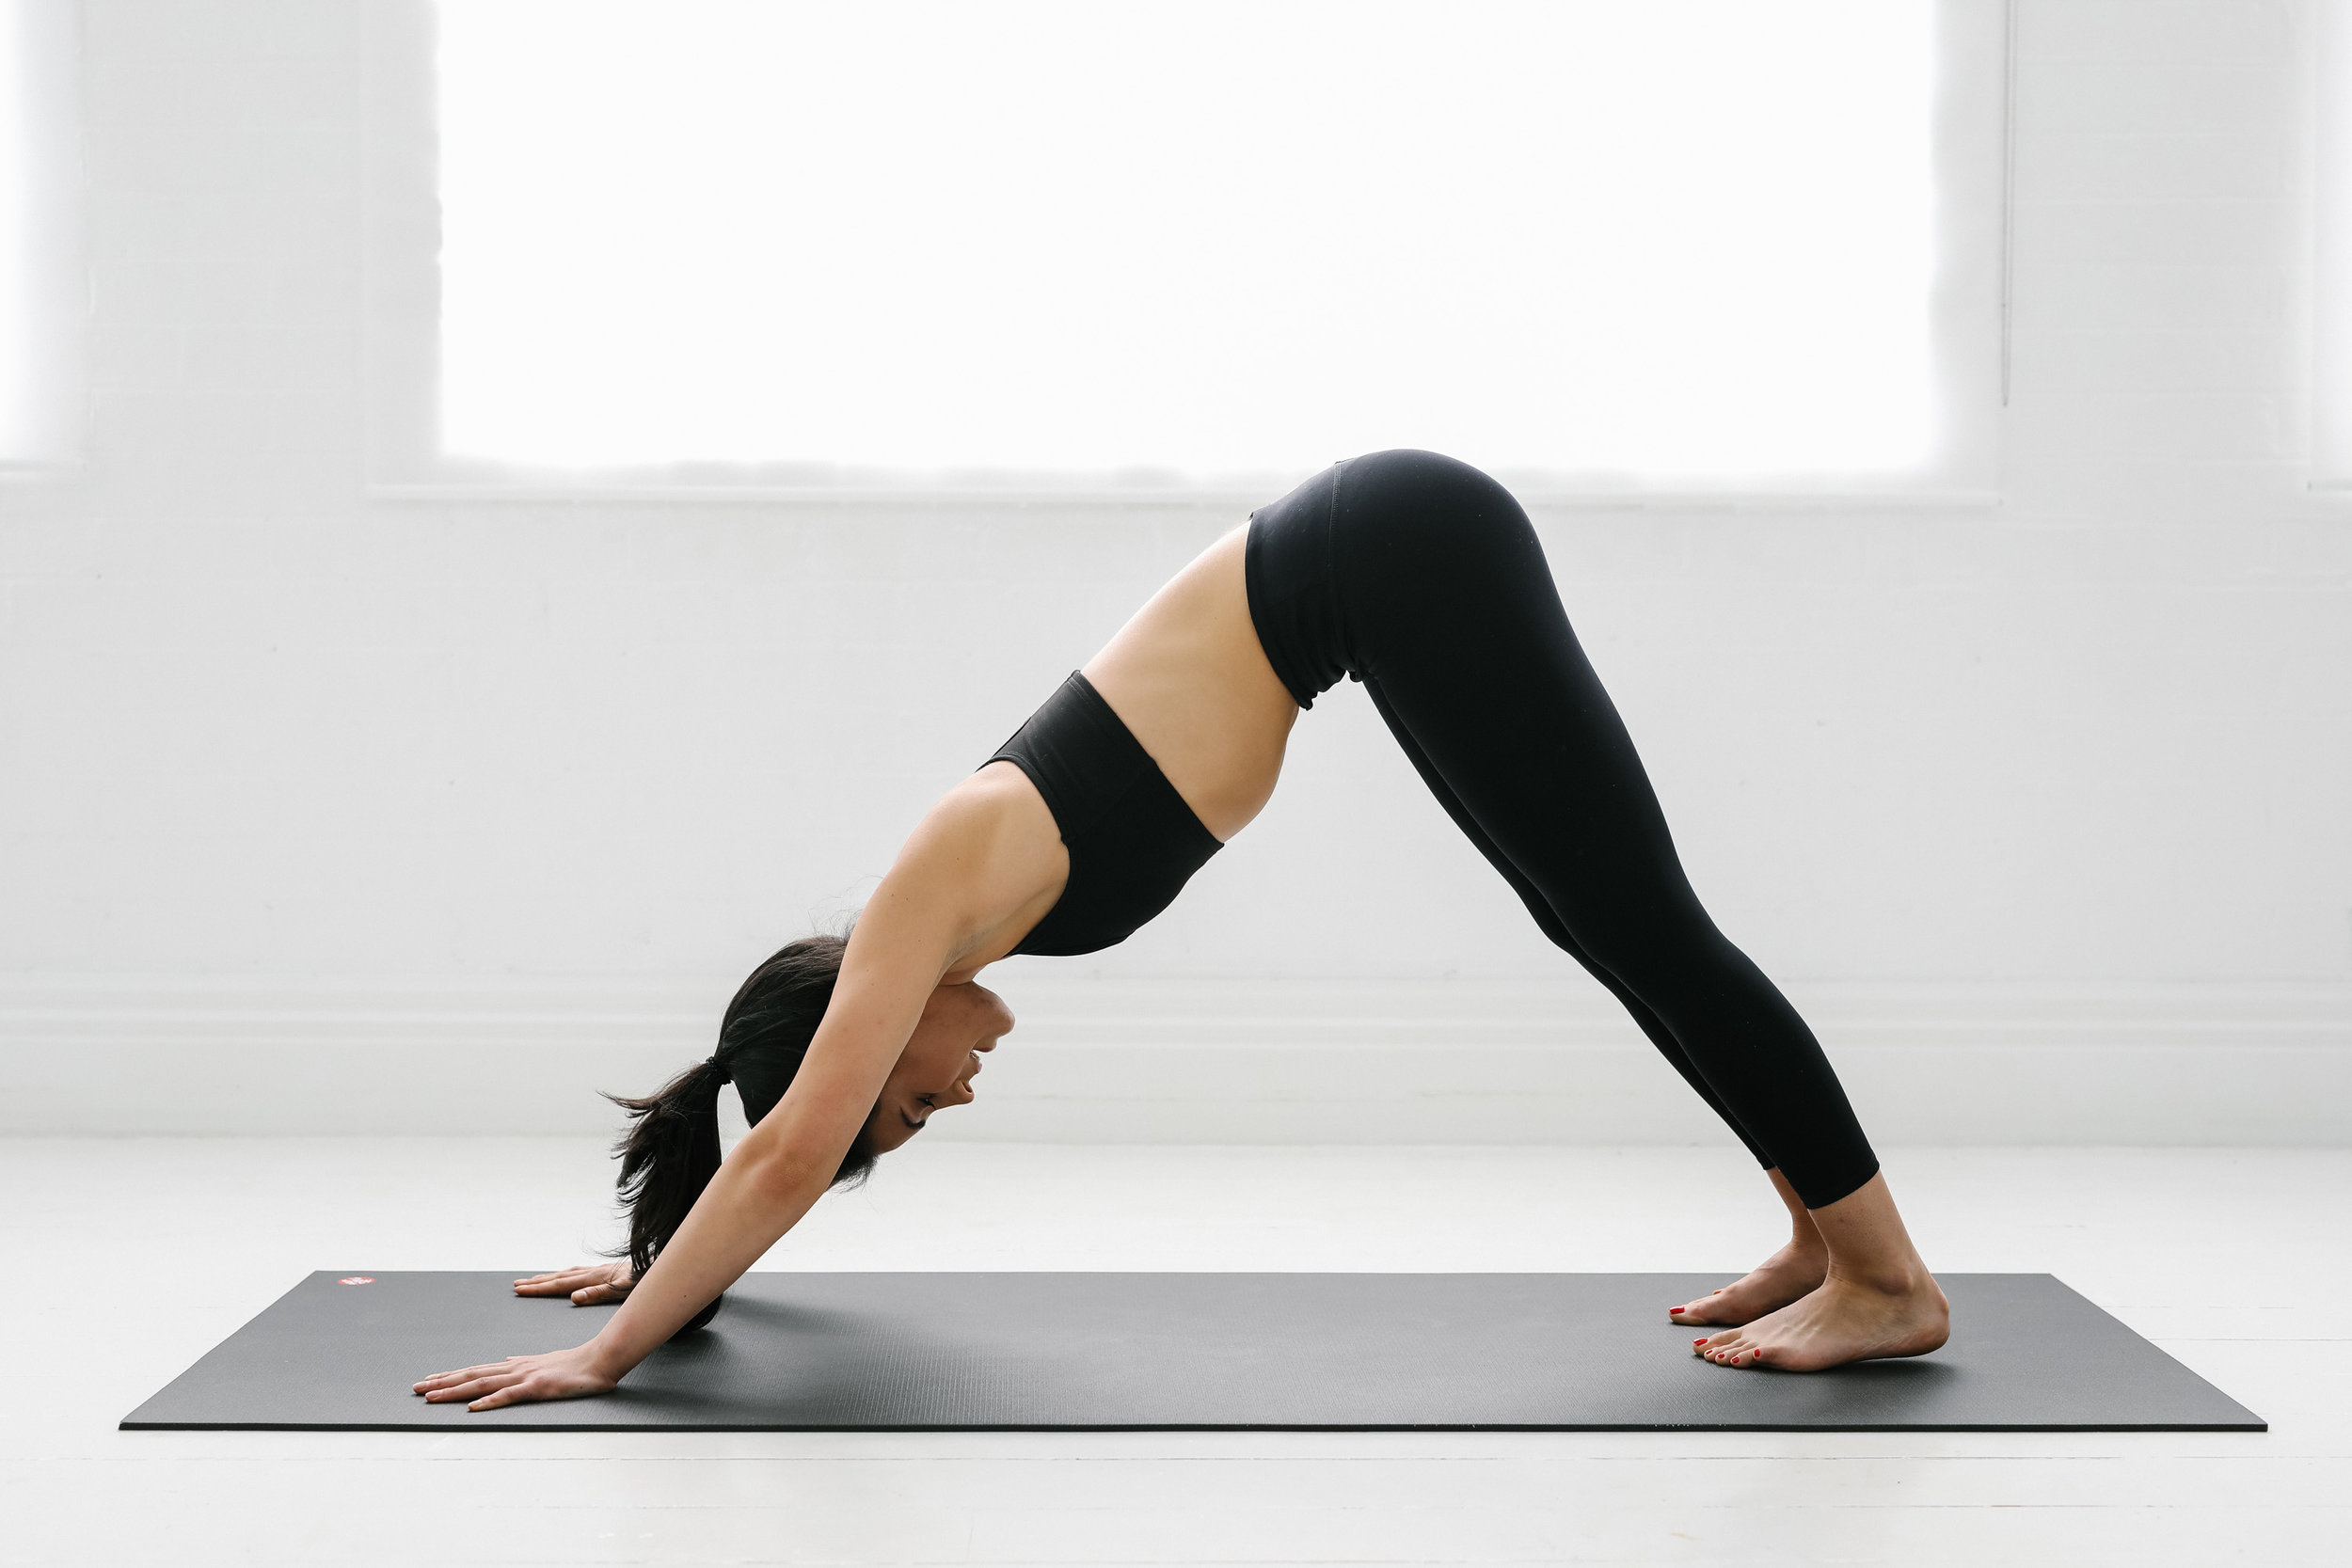 Marnie Hawson, Melbourne lifestyle photographer for Meg James - Melbourne life coach, yoga and meditation teacher